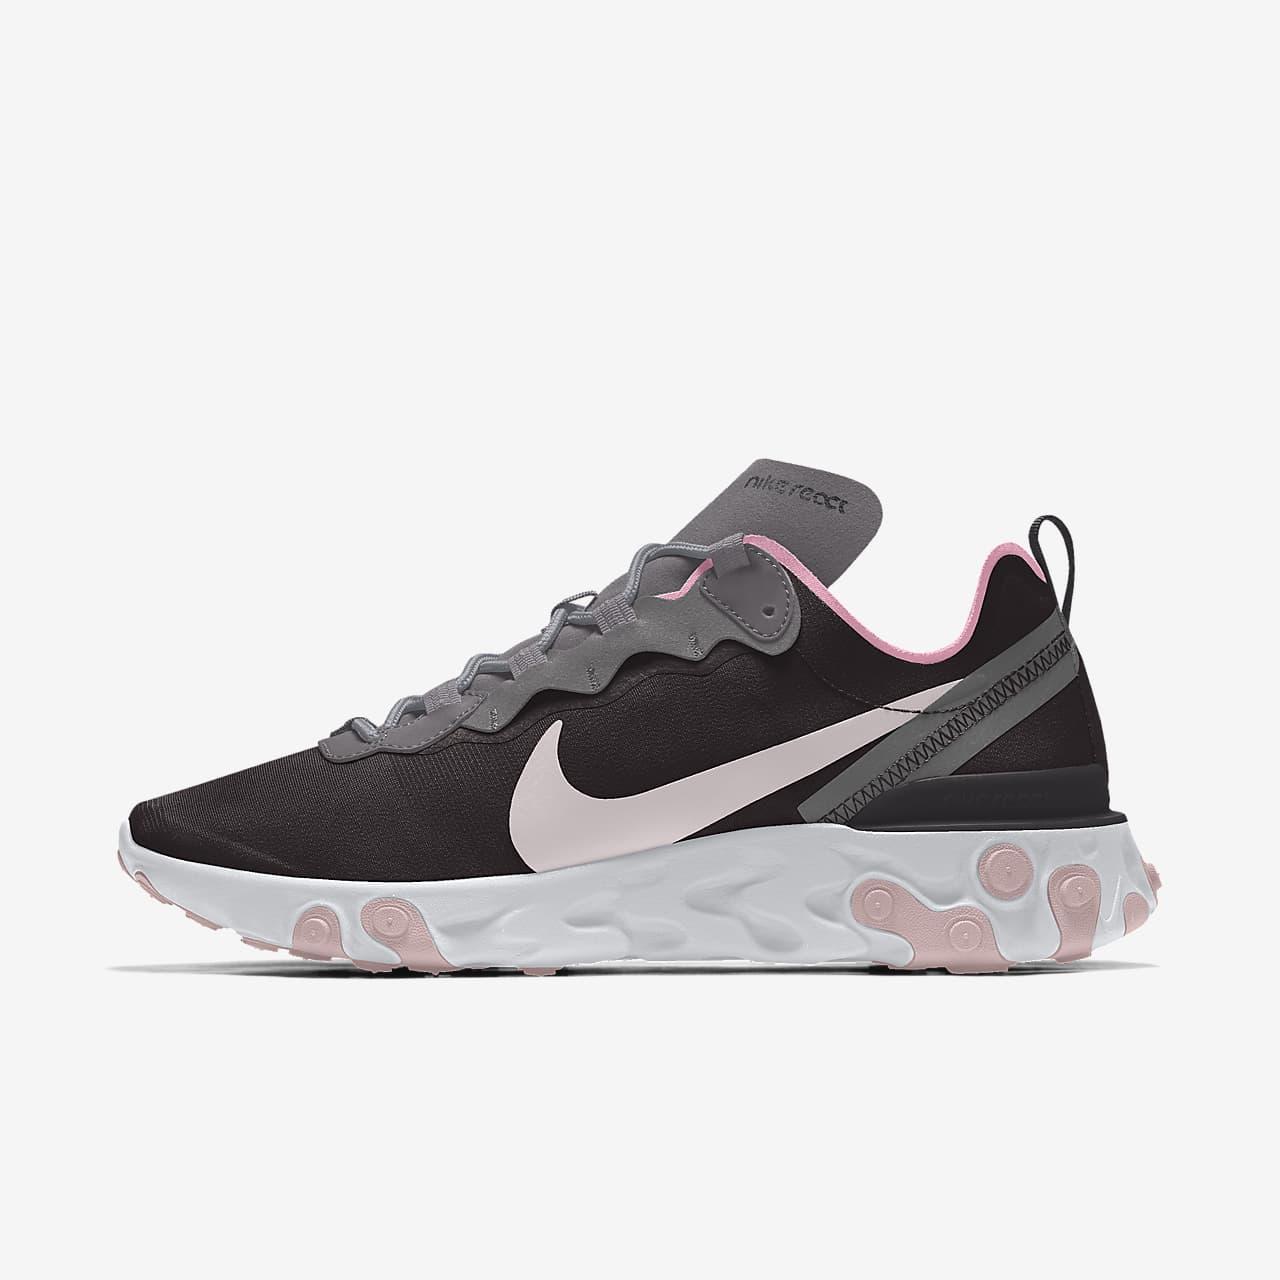 Nike React Element 55 By You 專屬訂製女款運動生活鞋